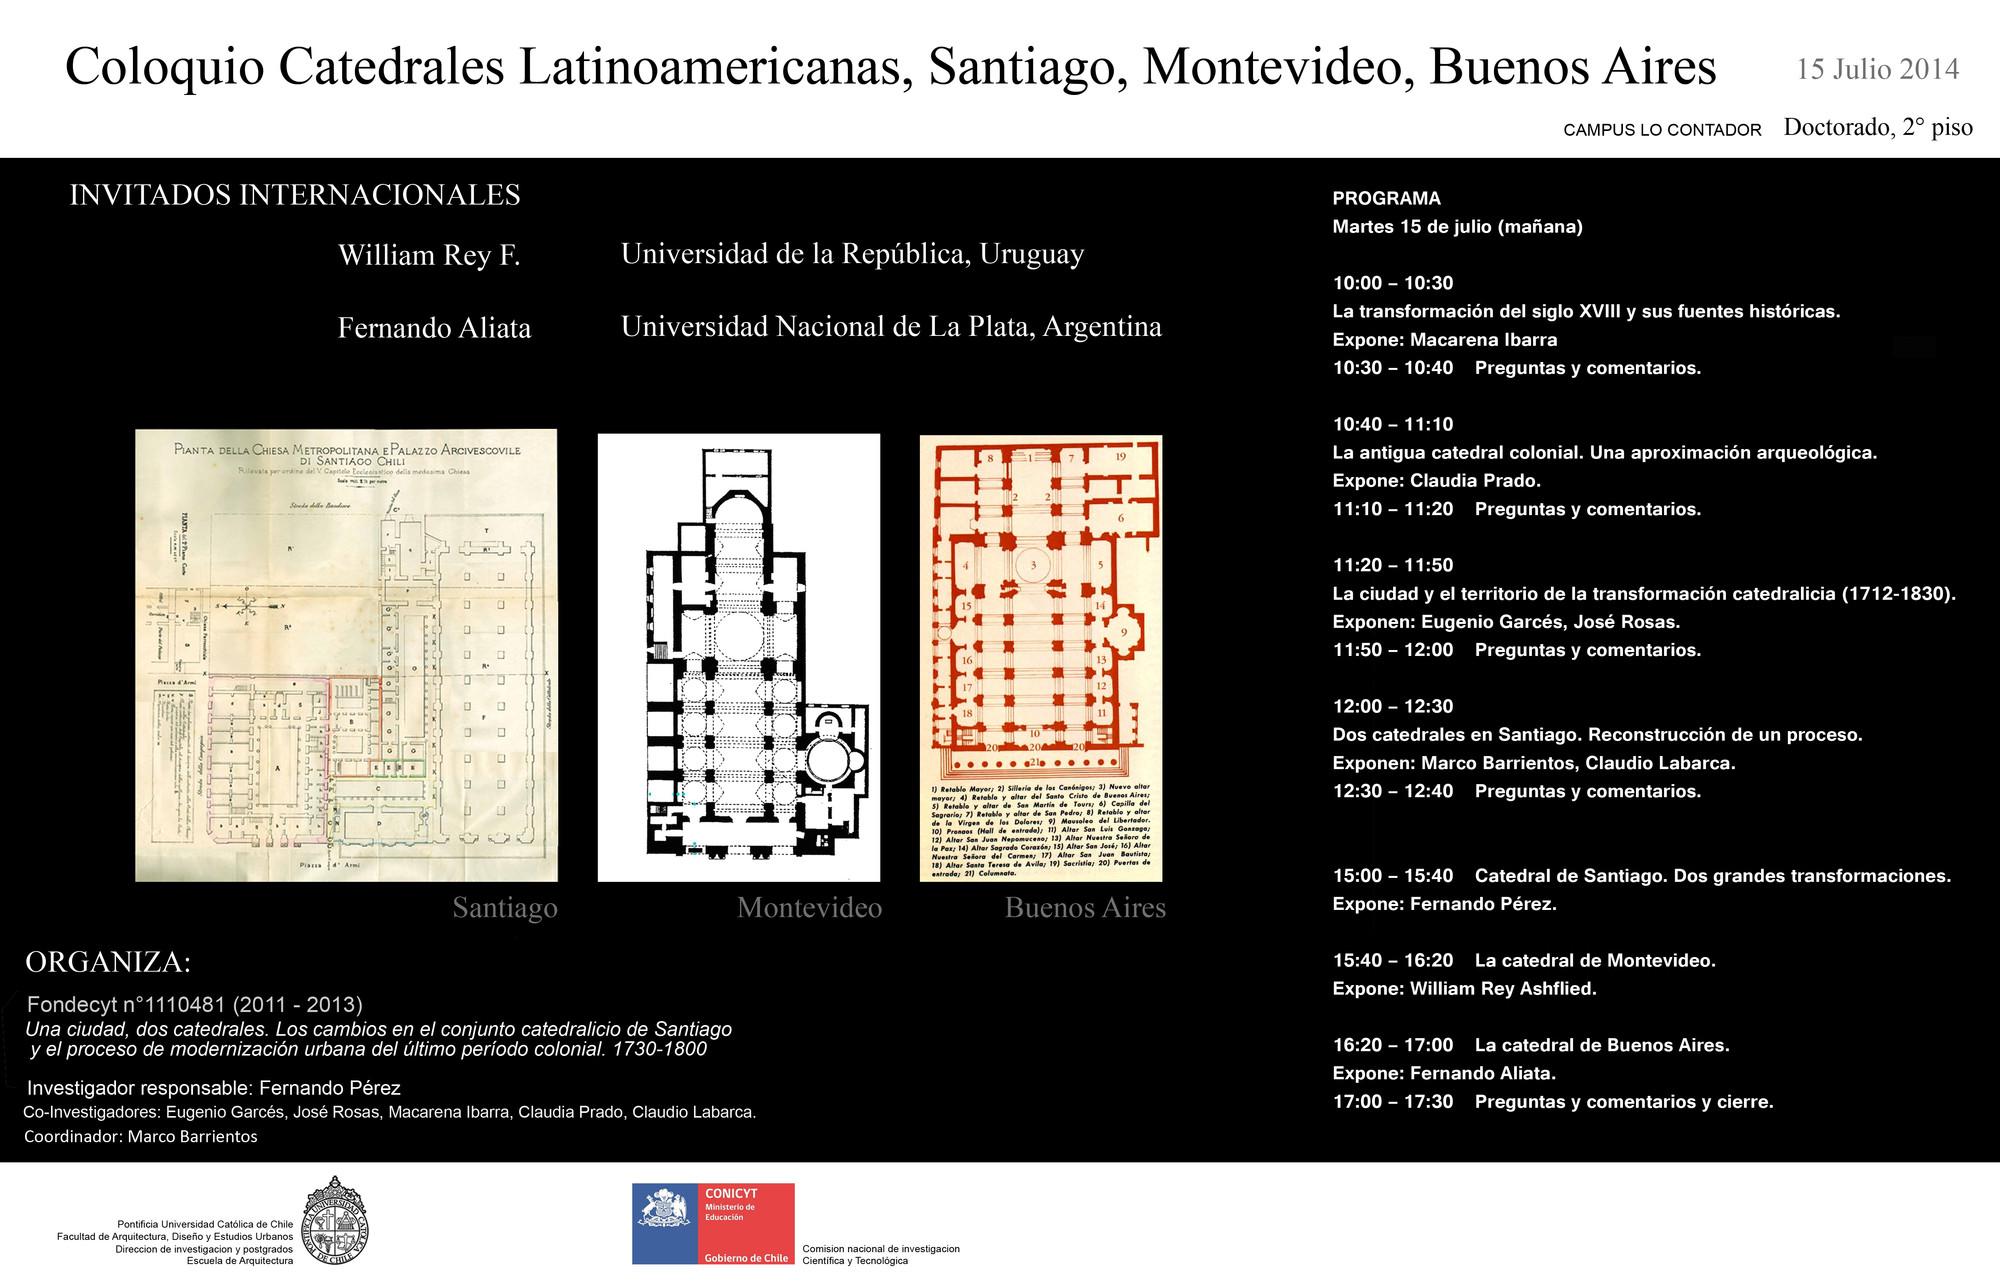 Coloquio sobre catedrales latinoamericanas: Santiago, Montevideo, Buenos Aires / Santiago, Chile